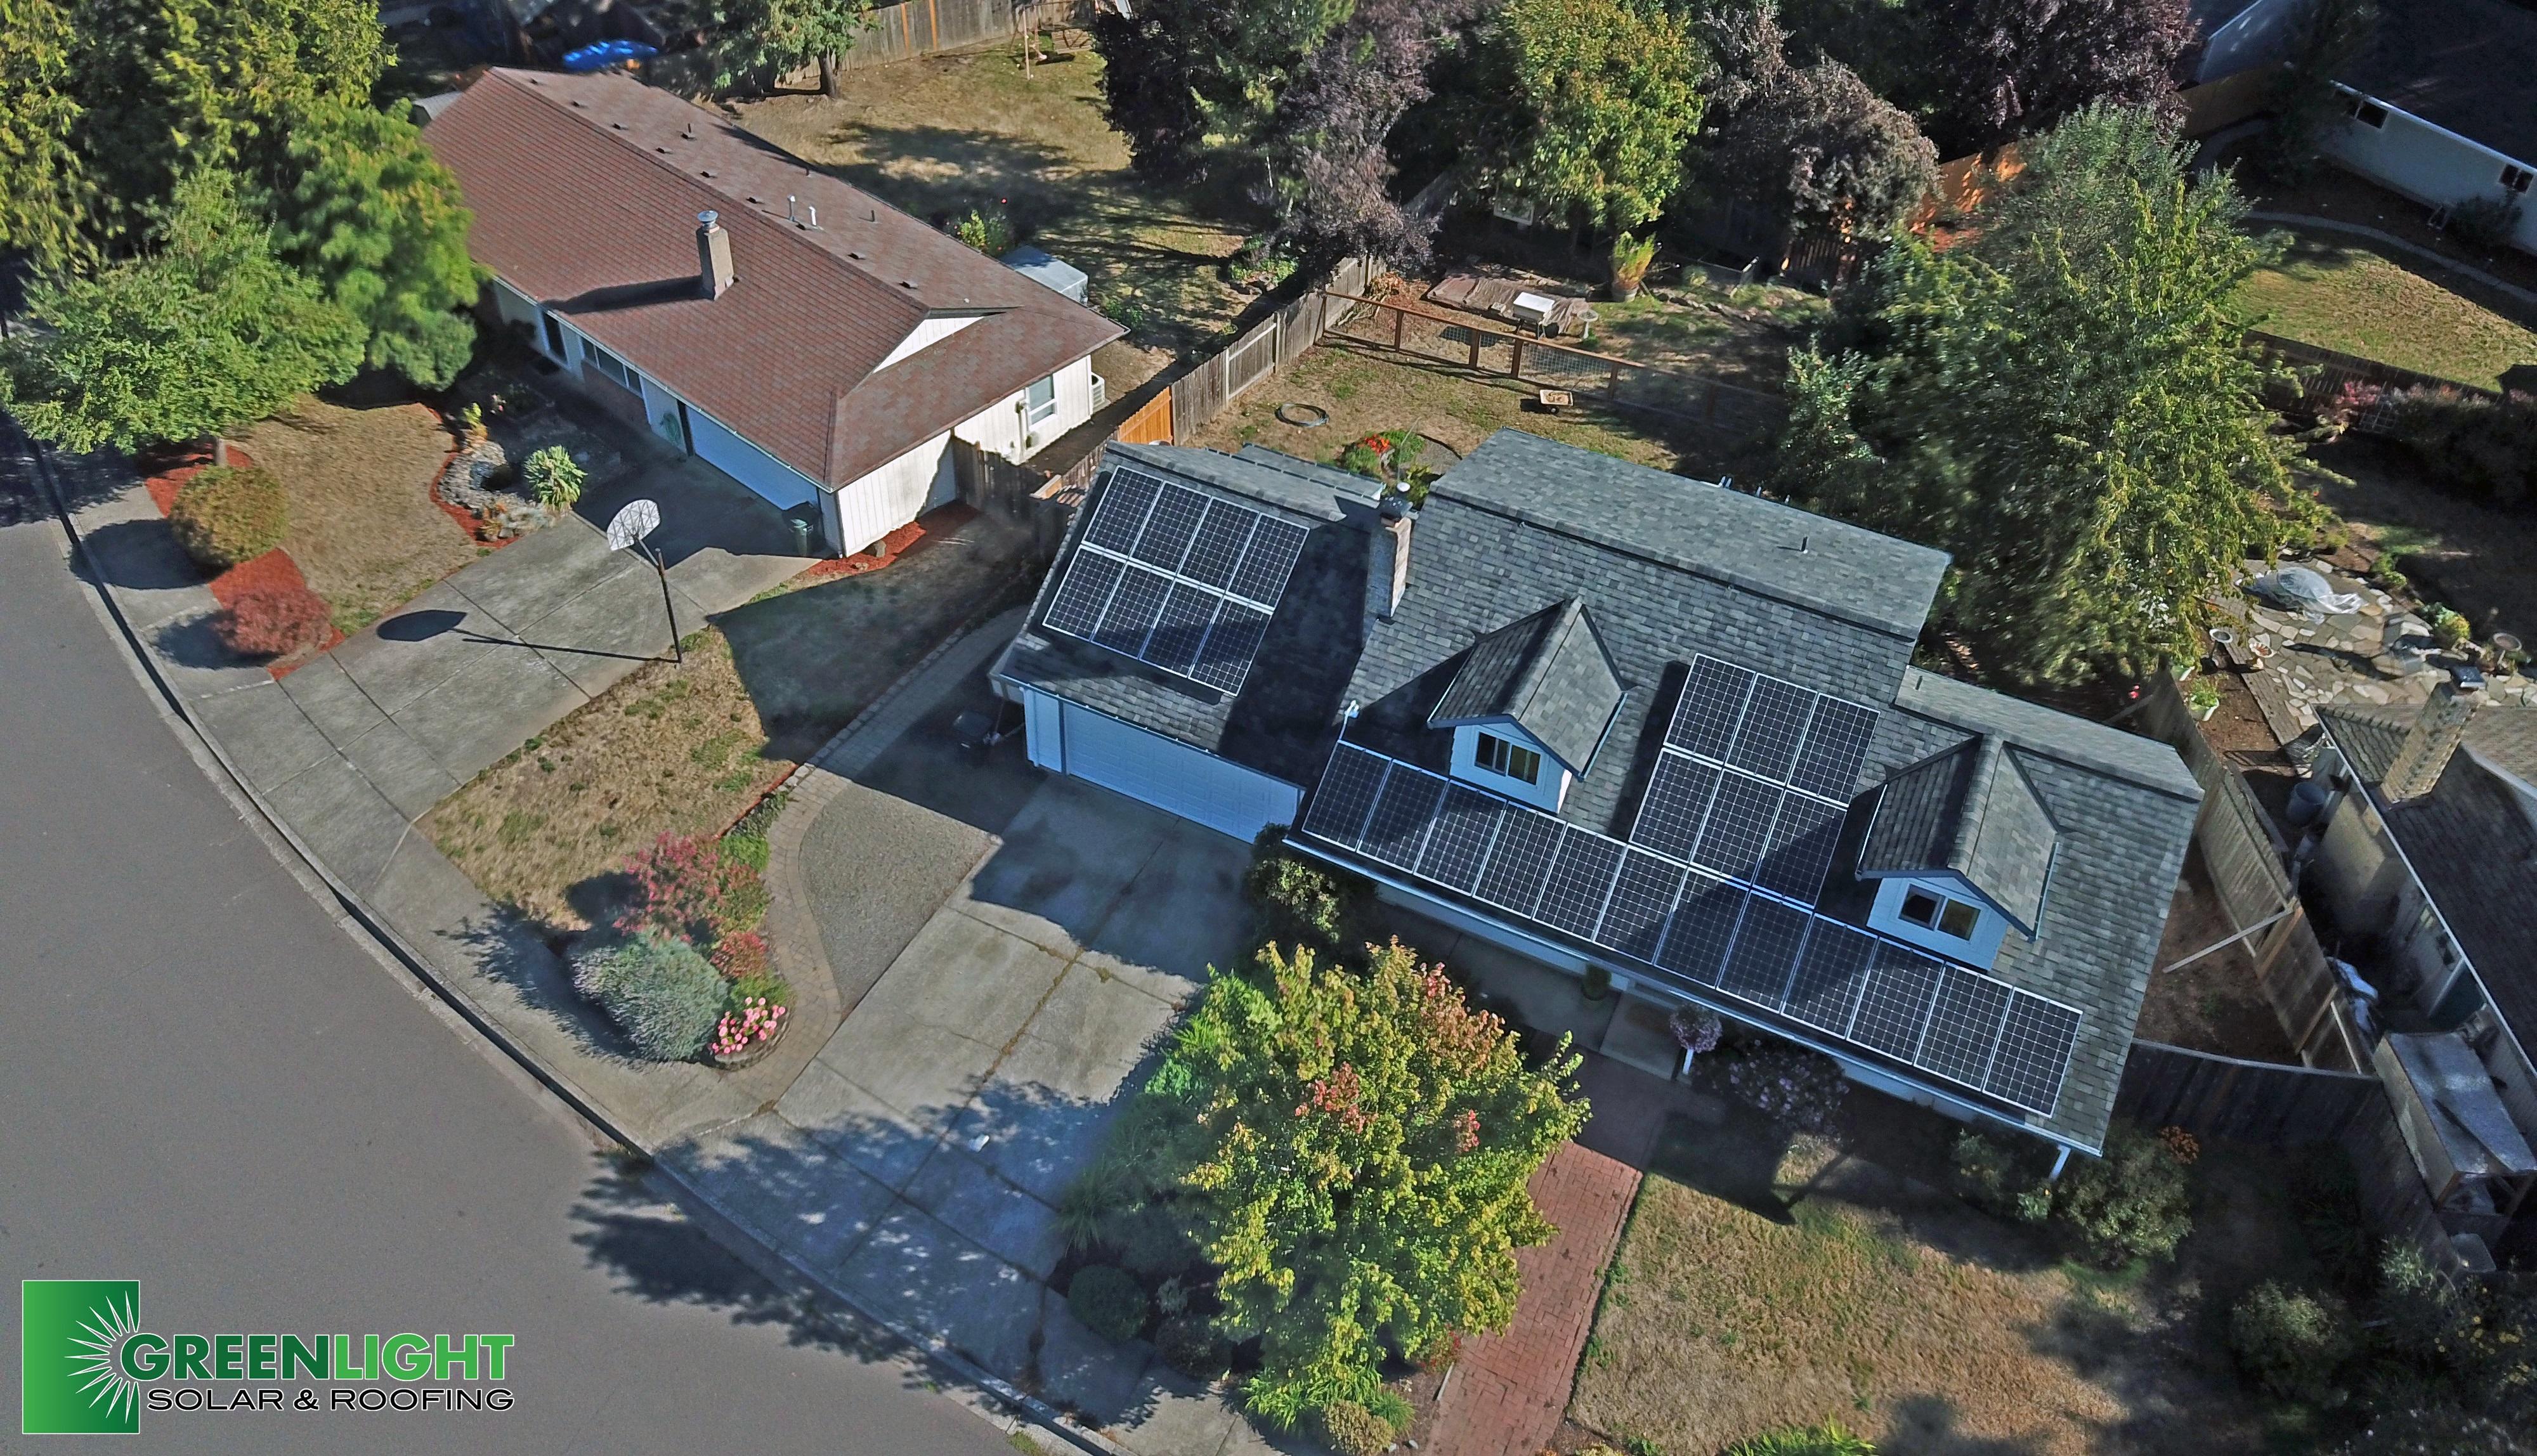 GreenLight Solar & Roofing image 2